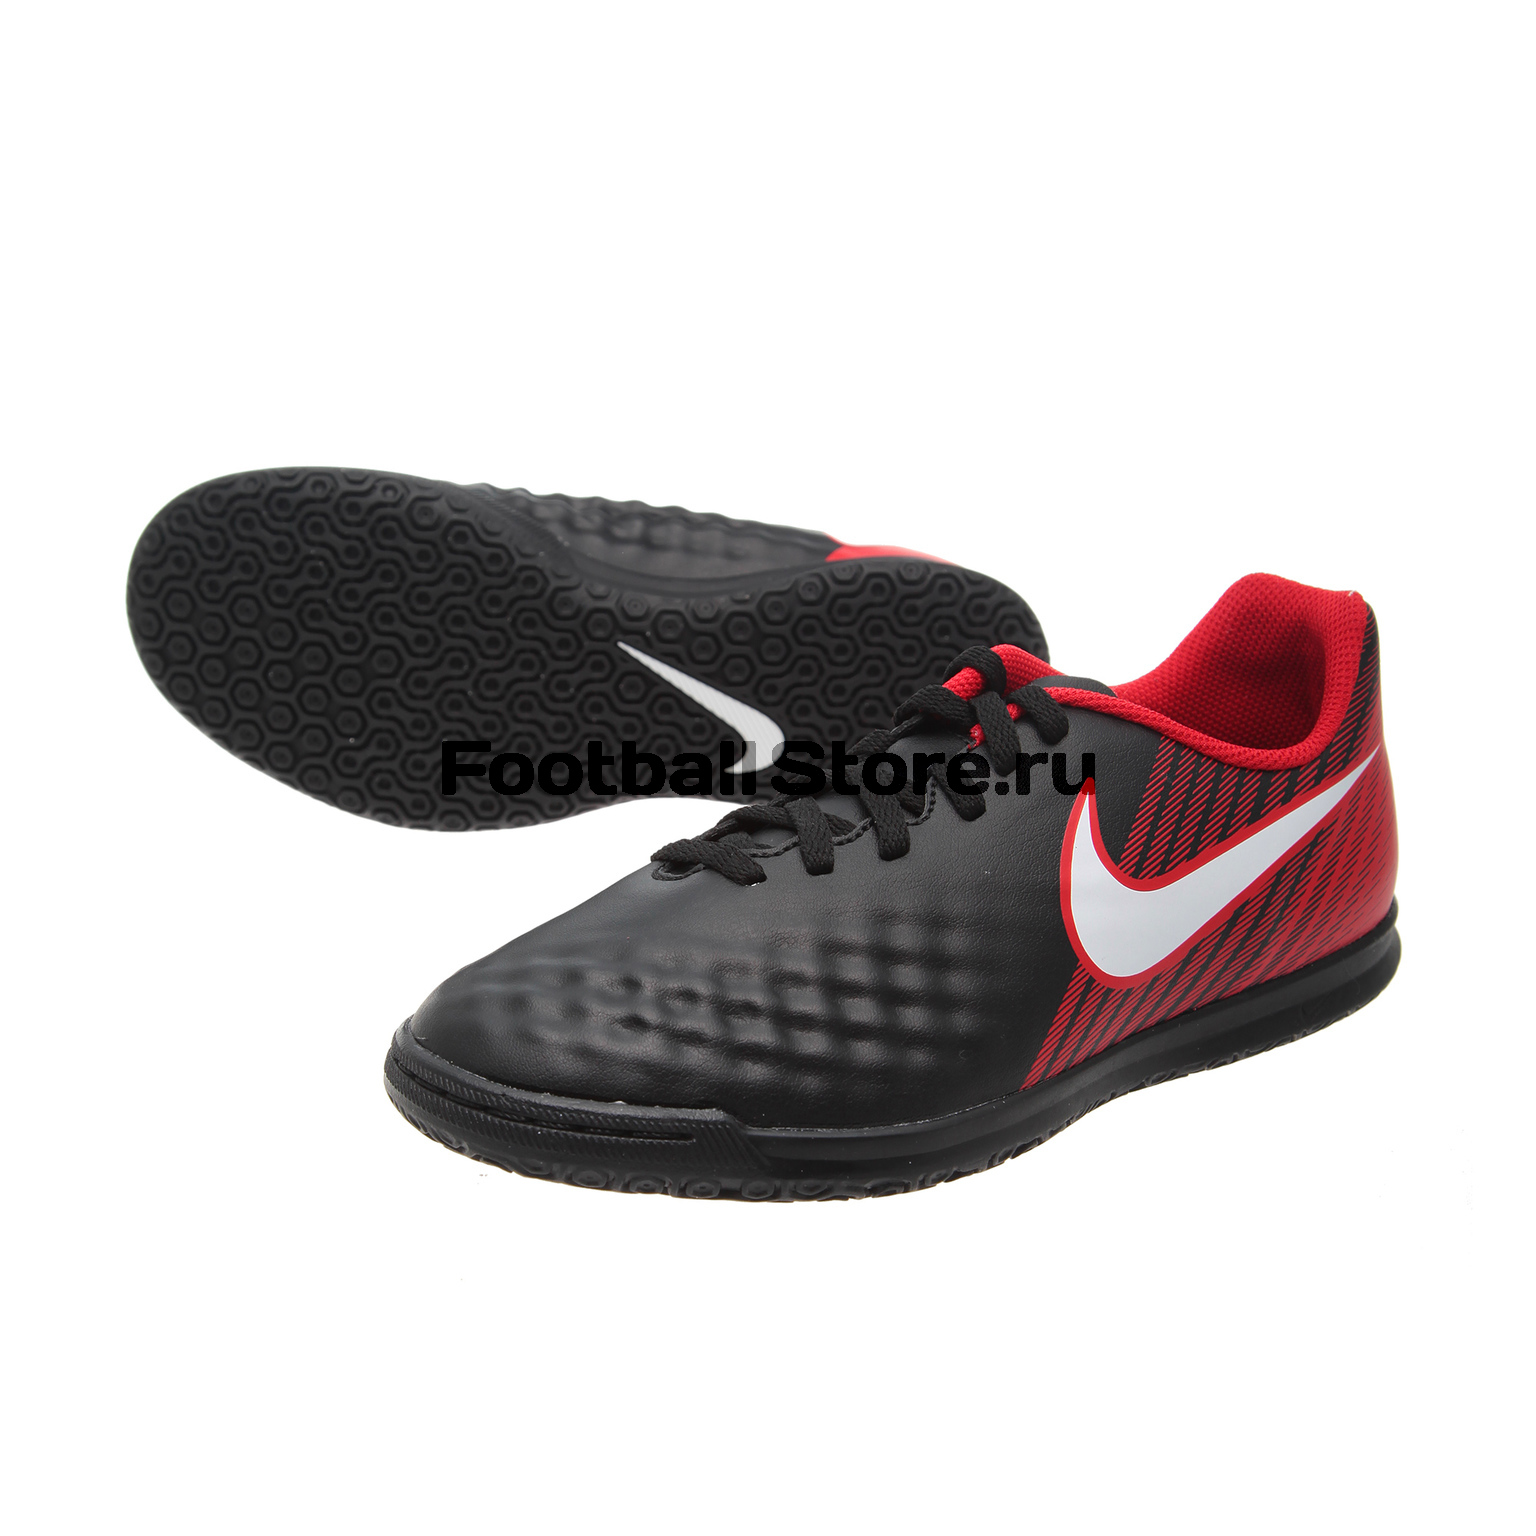 Обувь для зала Nike JR MagistaX Ola II IC 844423-061 бутсы nike jr magista ola ii fg 844204 414